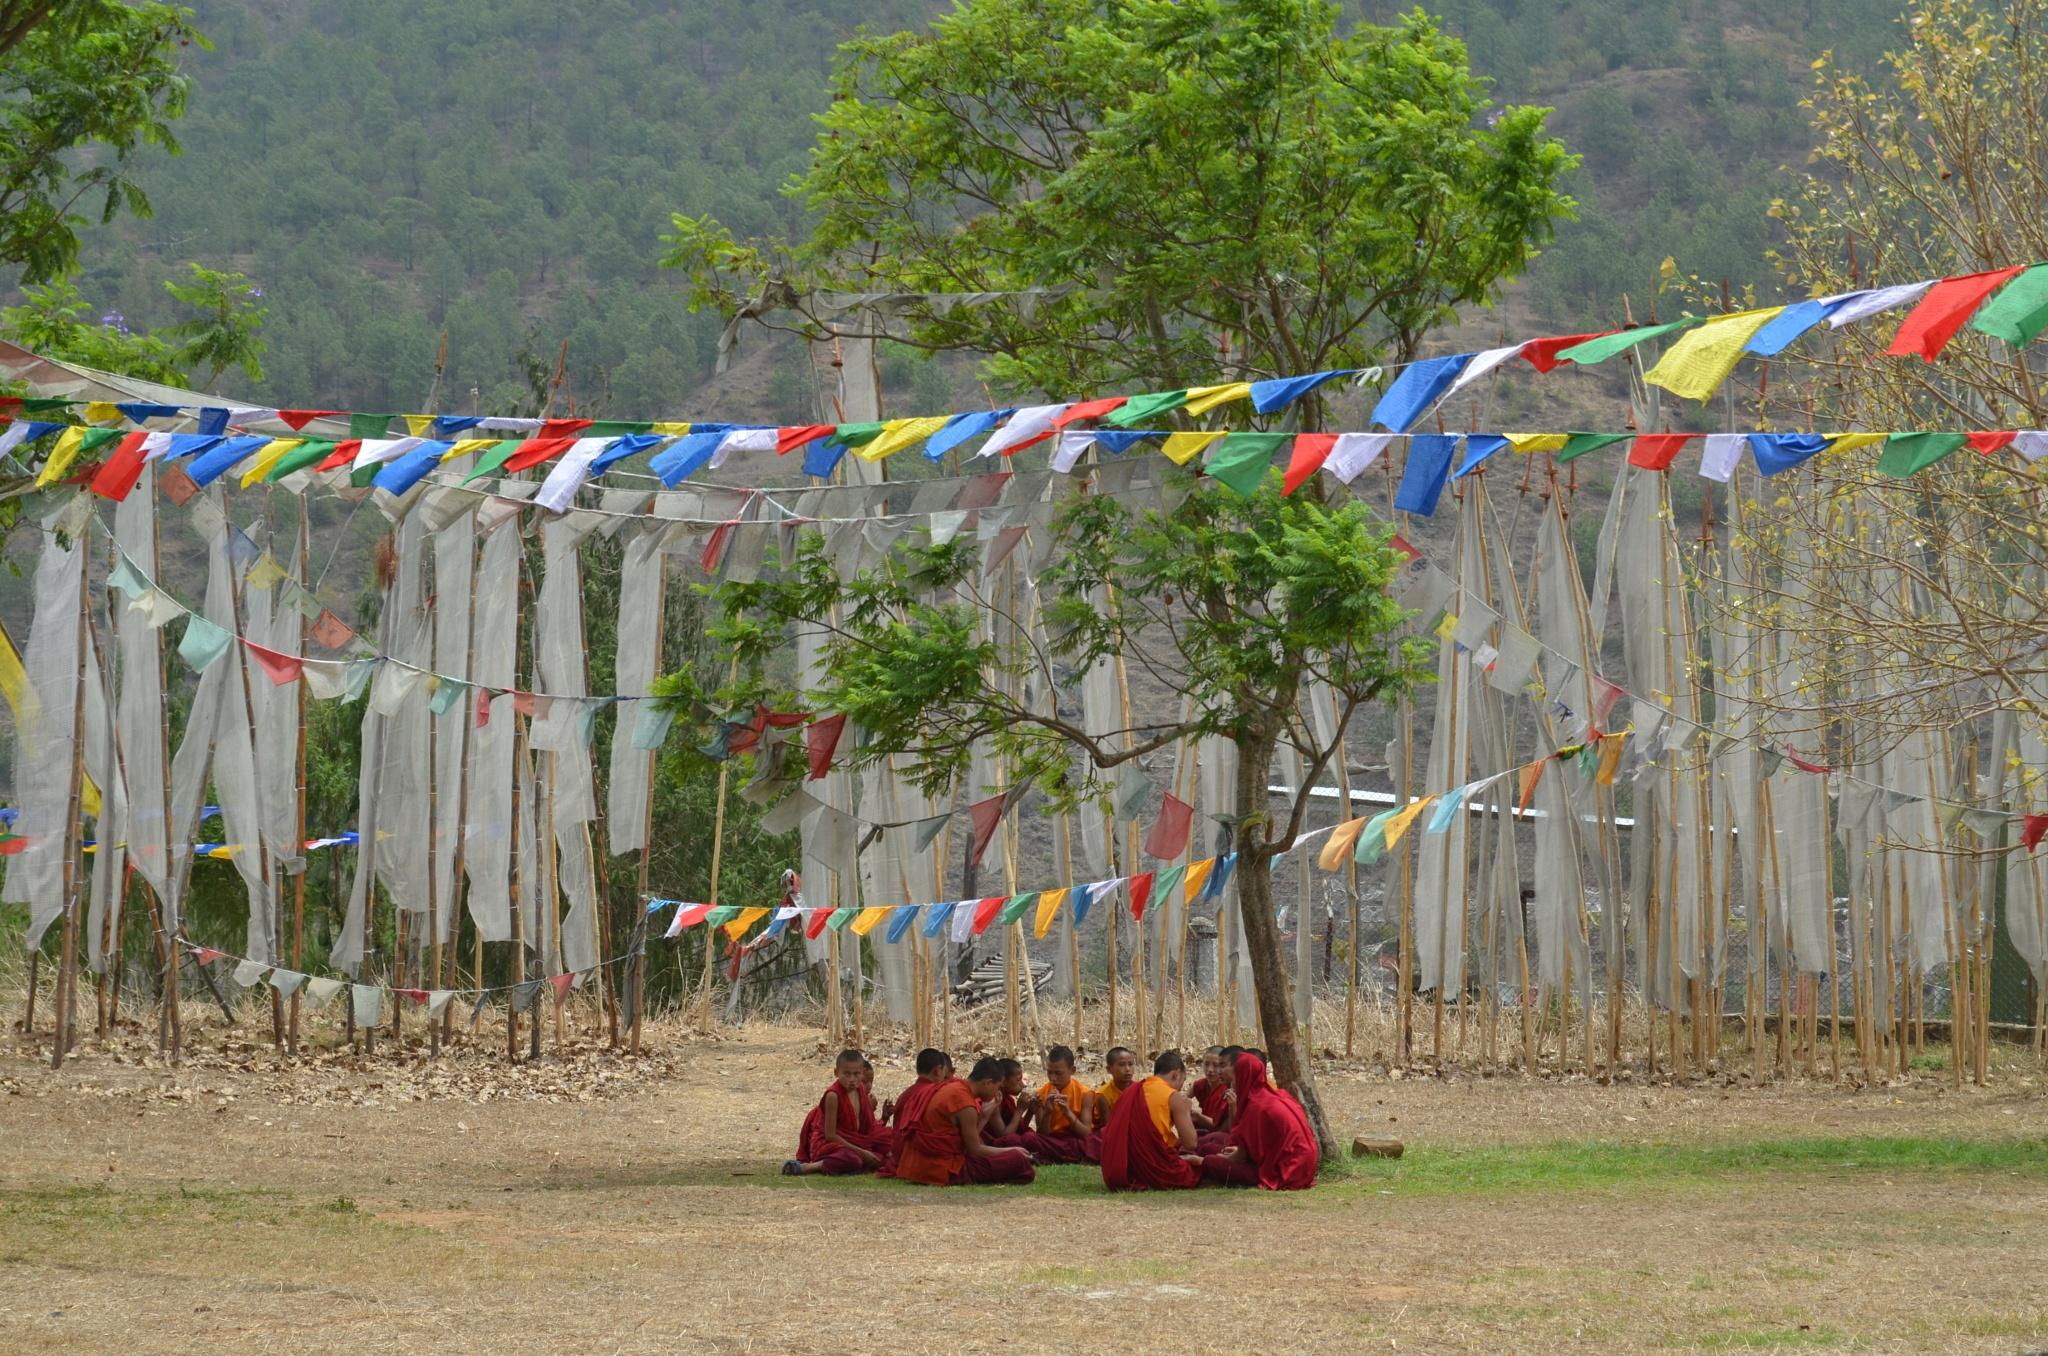 Young Monk by Shrenik Dodhia